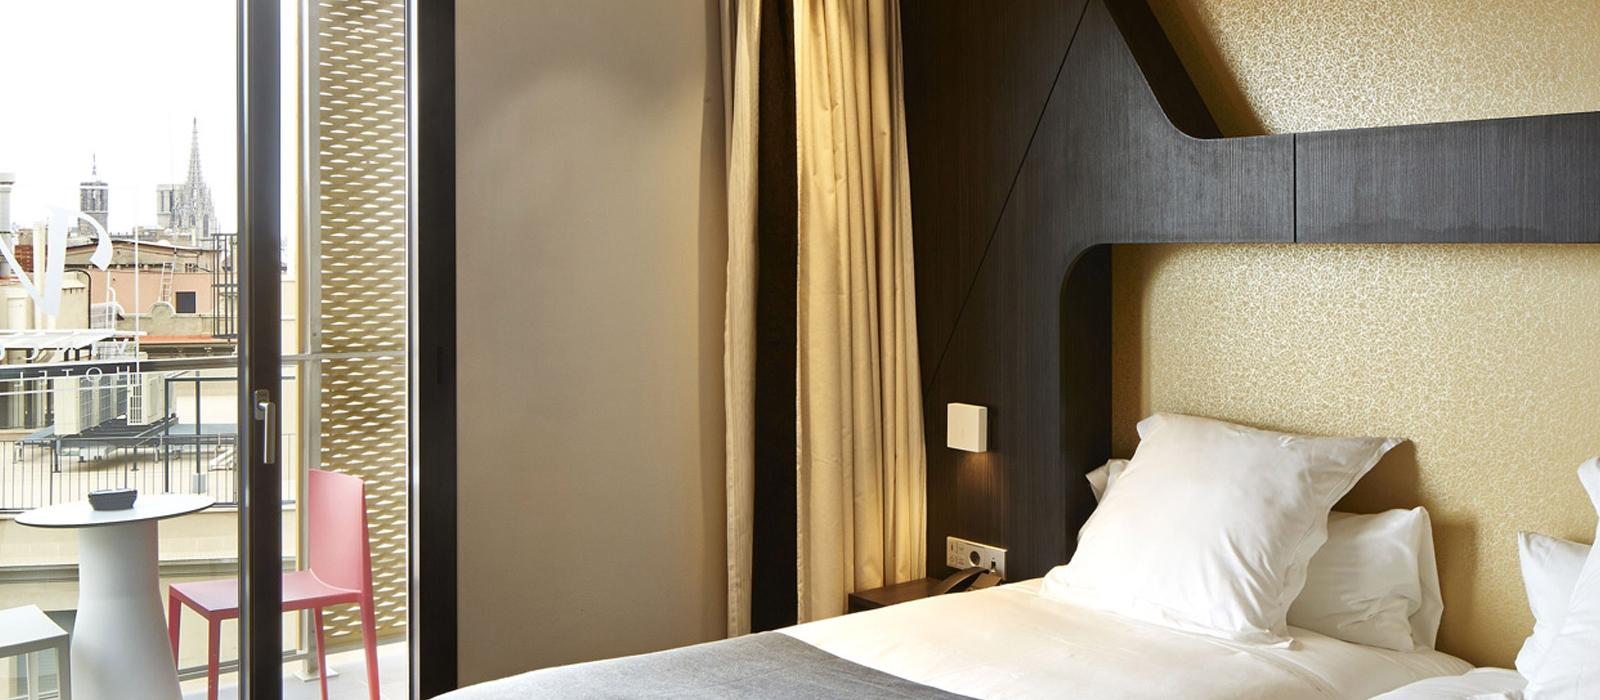 Rooms Hotel Barcelona Gala - Vincci Hotels - Superior Room